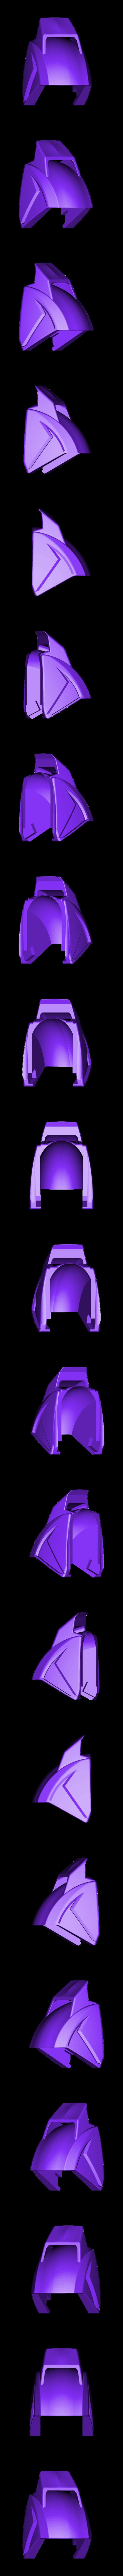 front_fender_.stl Download free STL file 2016 Ducati Draxter Concept Drag Bike RC • 3D printer template, brett